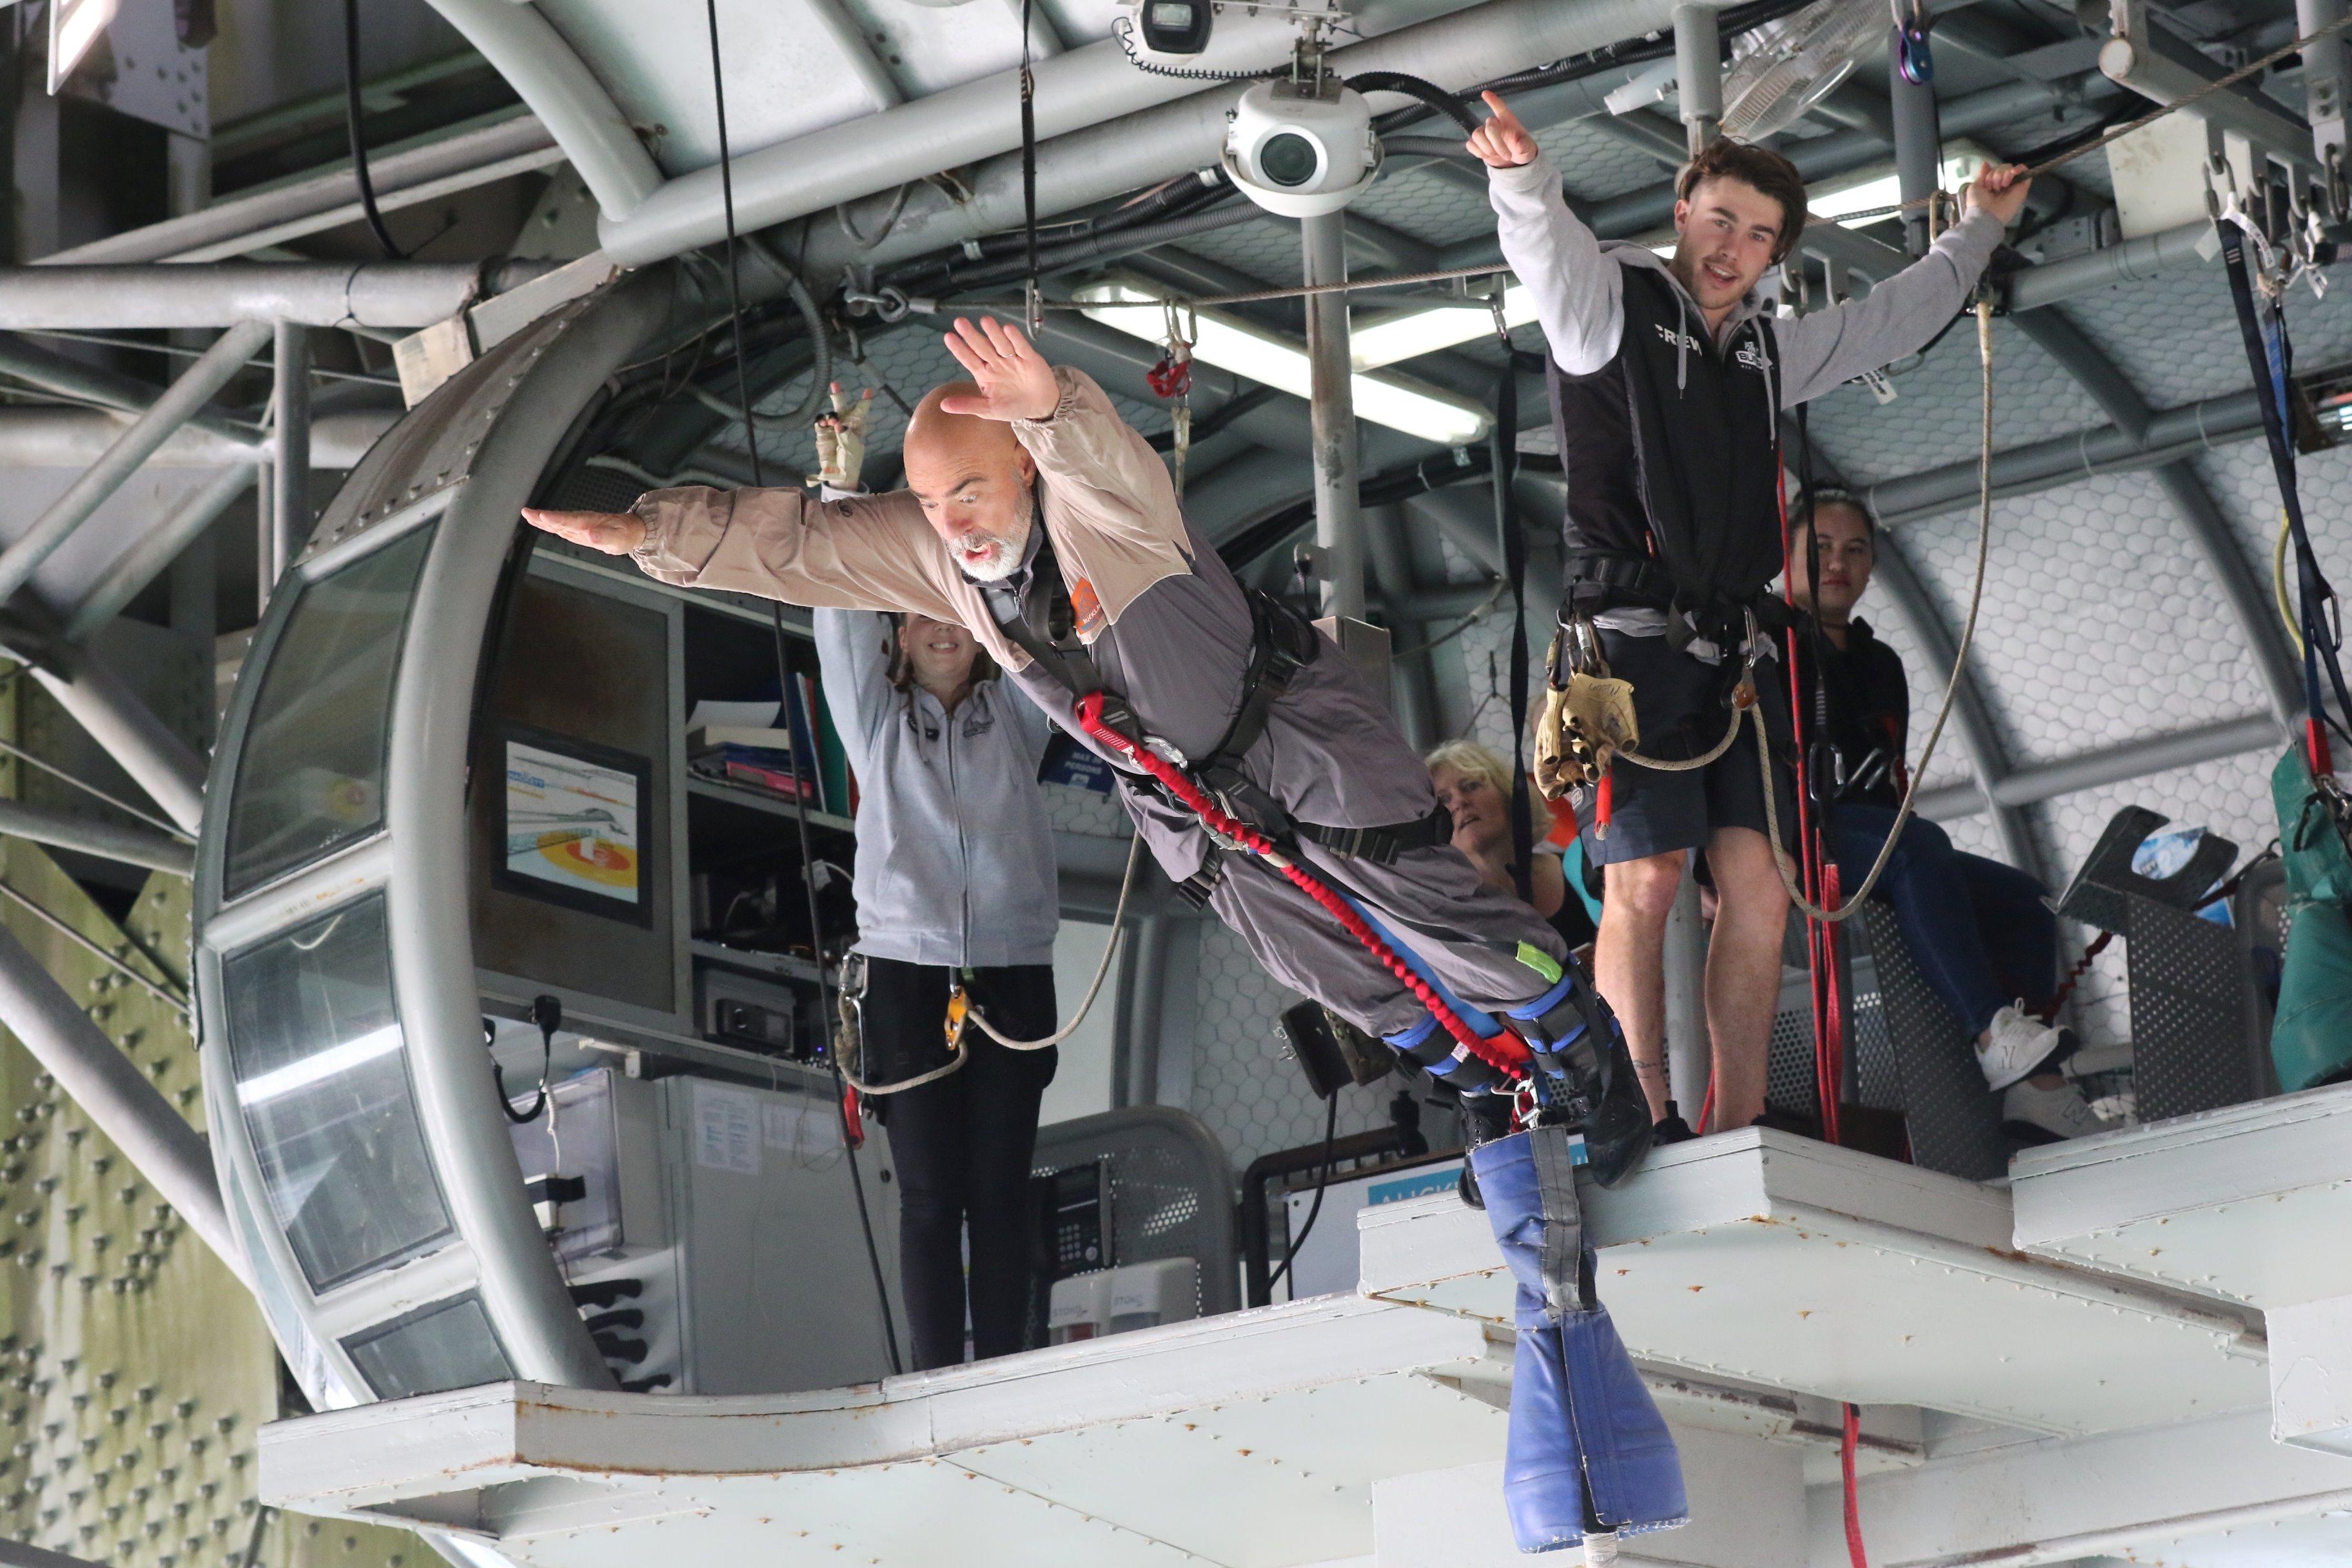 Steve doing a bungee jump off the Auckland Harbor Bridge, June 2018